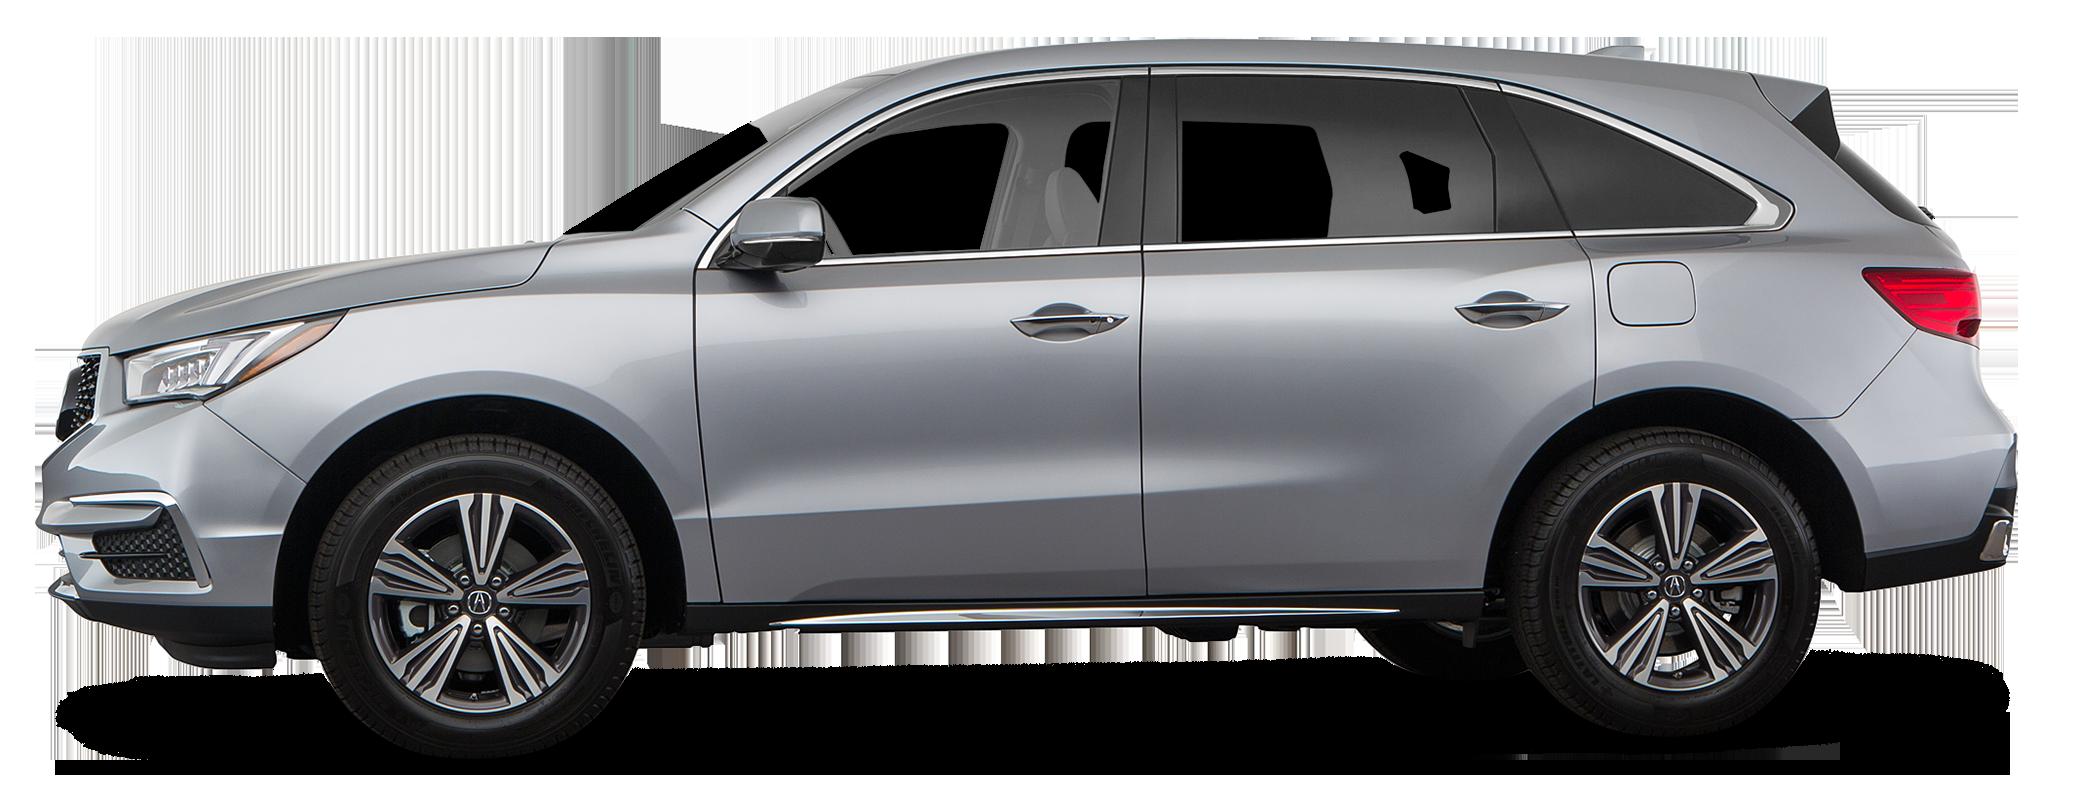 2020 Acura MDX SUV Base